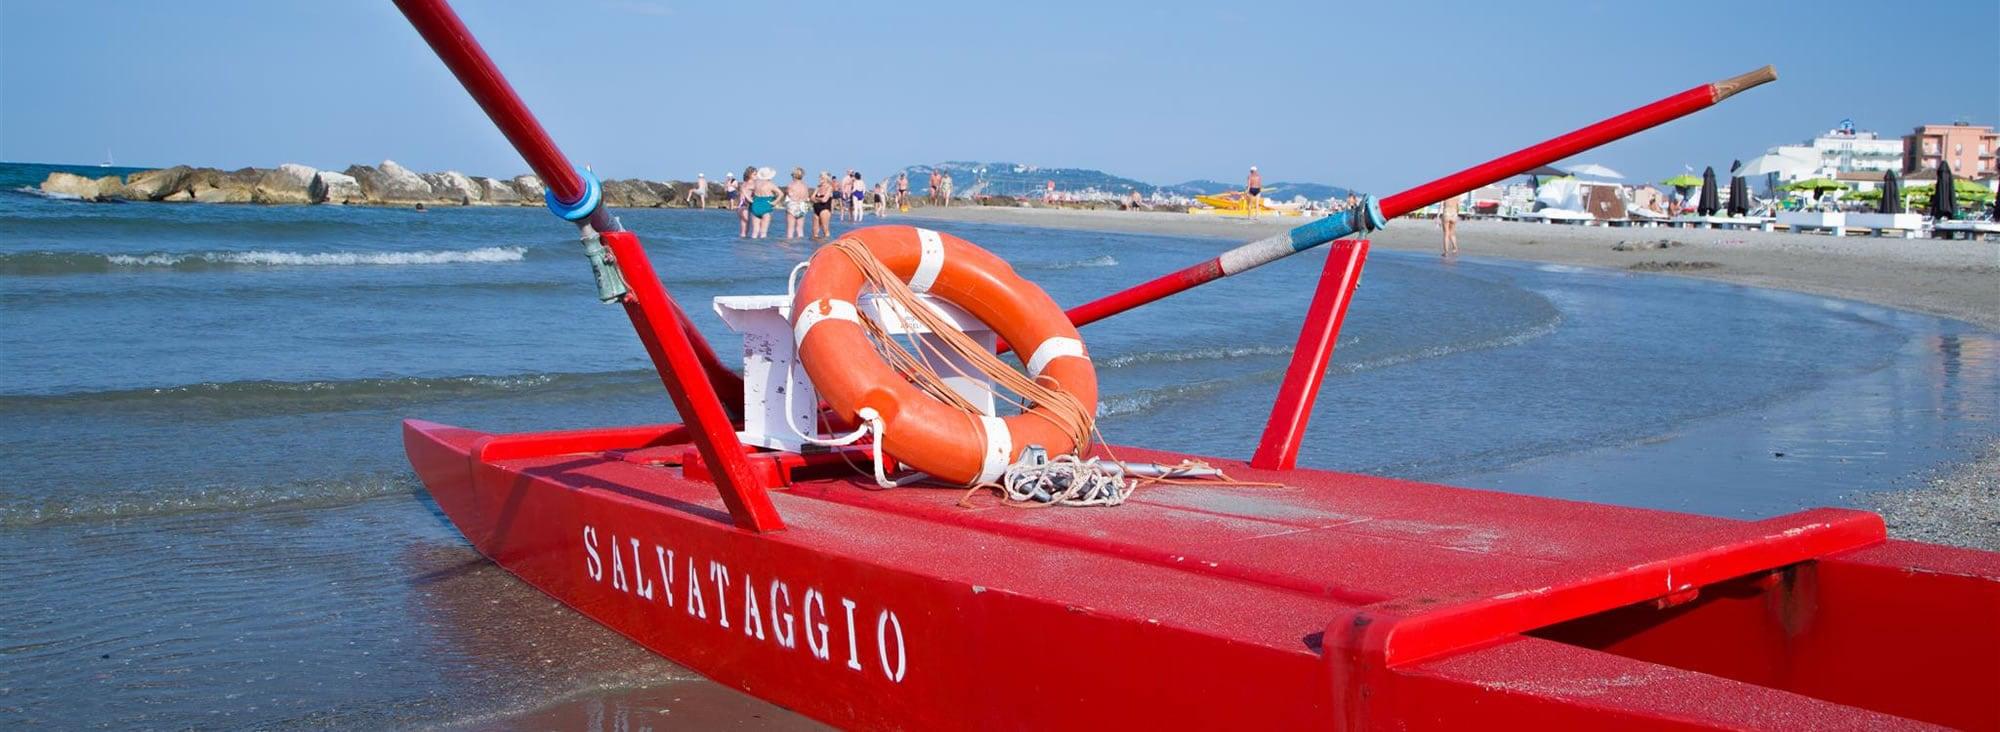 Misano Vacanze